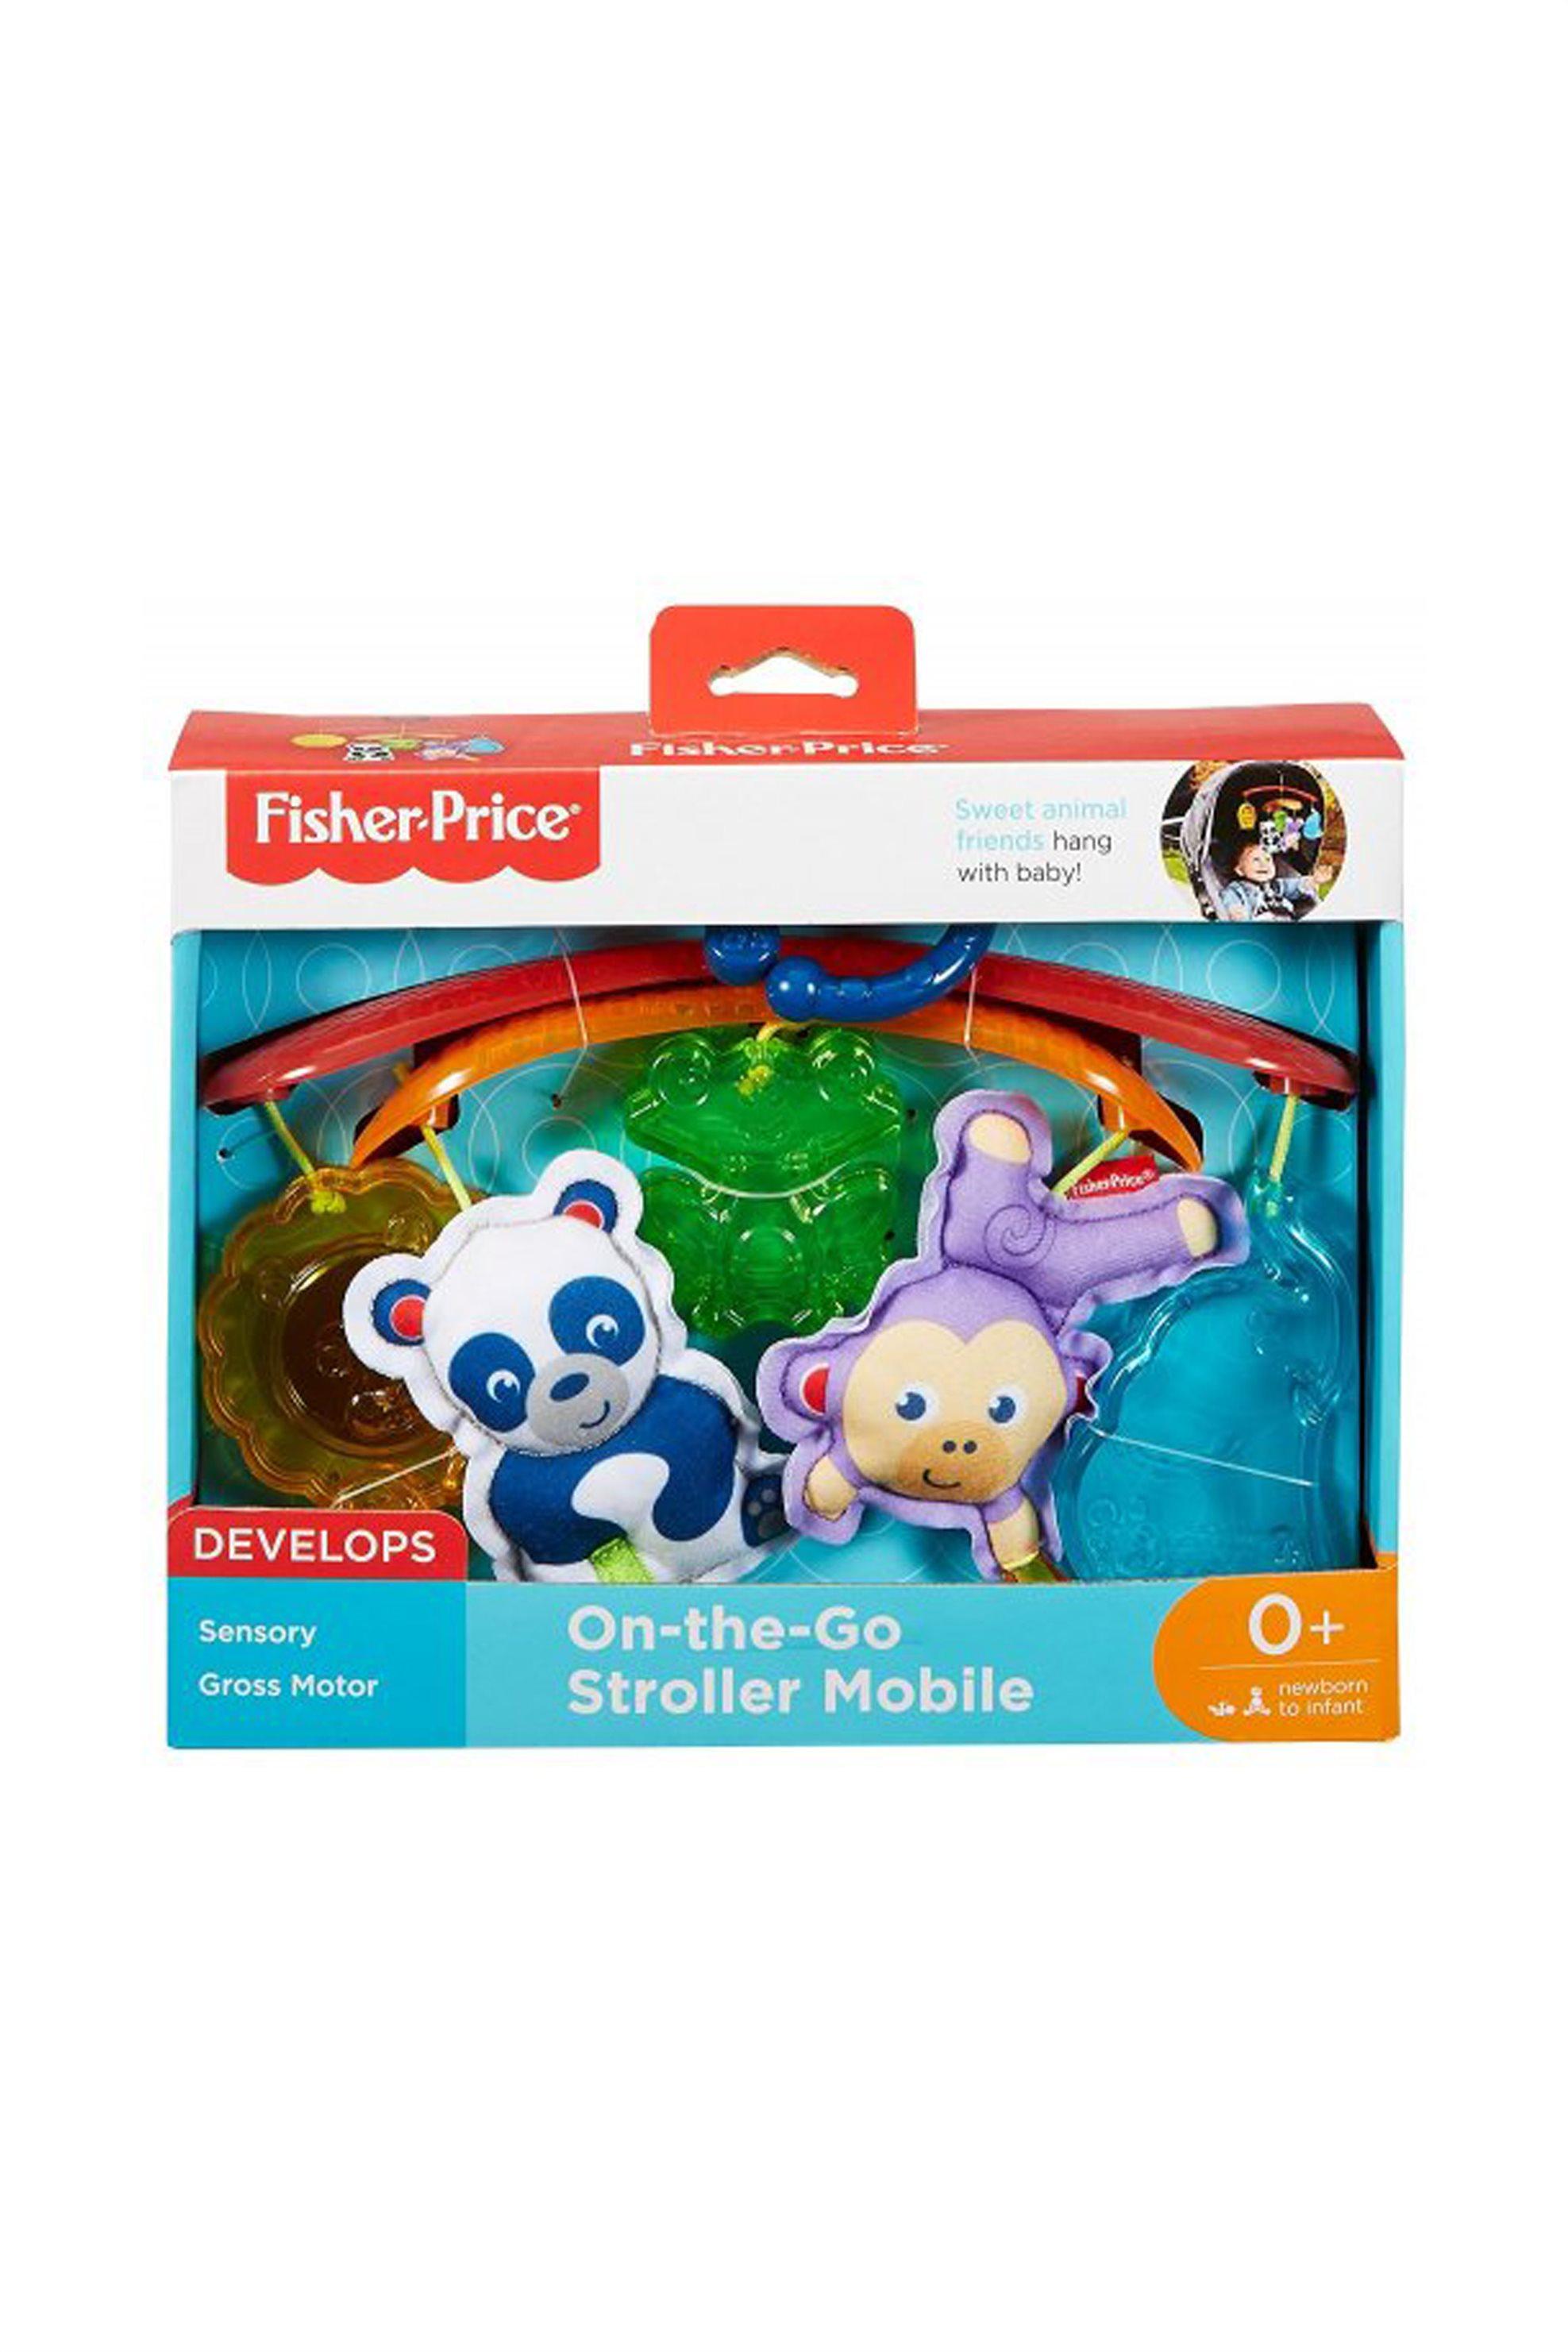 Mattel Μίνι Περιστρεφόμενο Με Ζωάκια Fisher Price - DYW54 παιδι   παιχνιδια   bebe